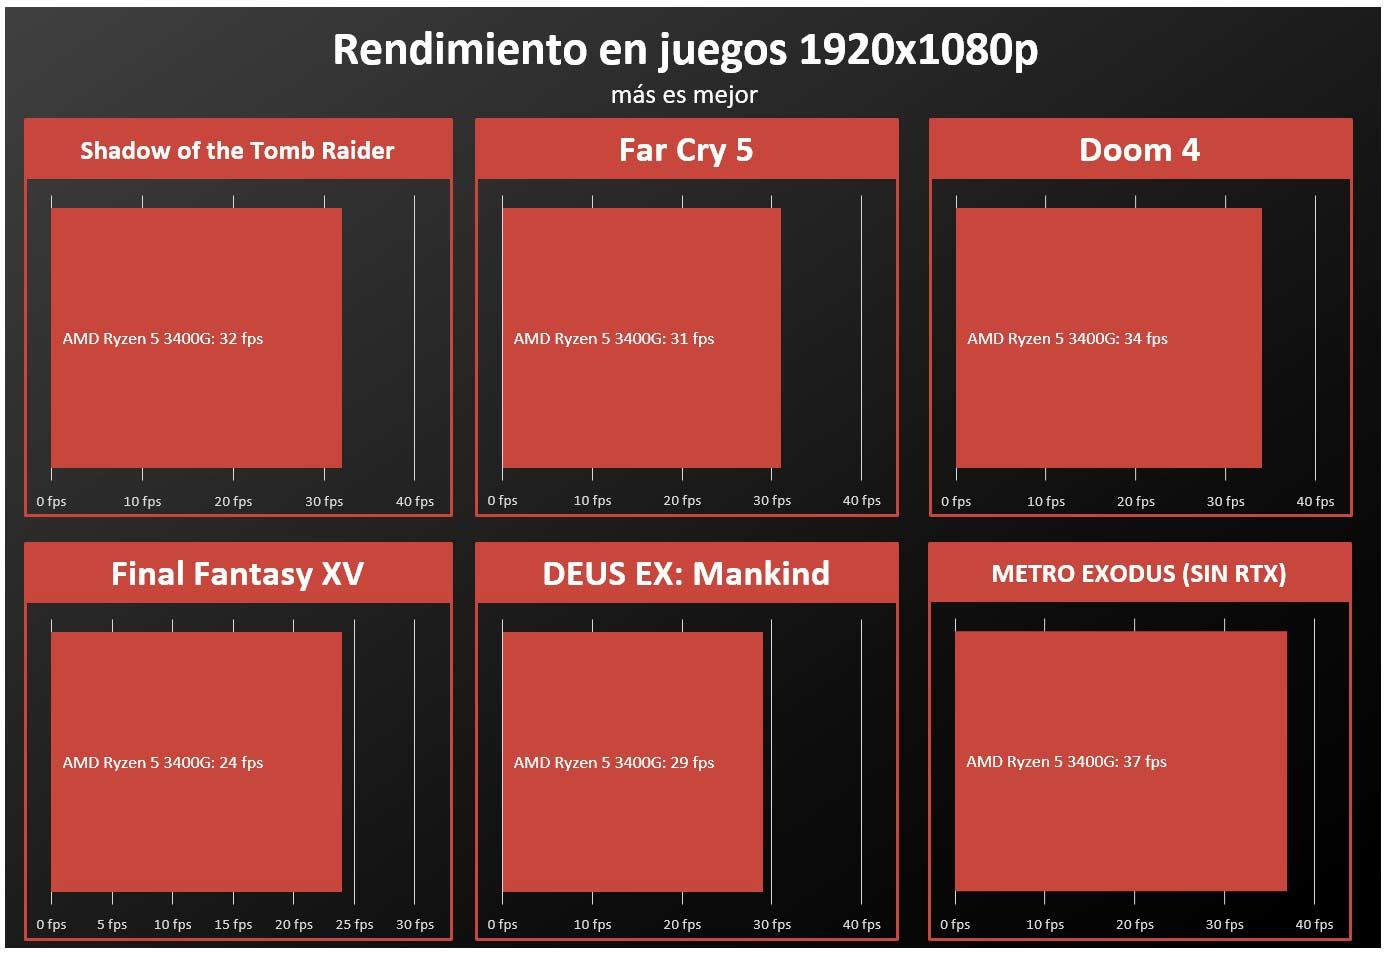 AMD Ryzen 5 3400G FPS APU